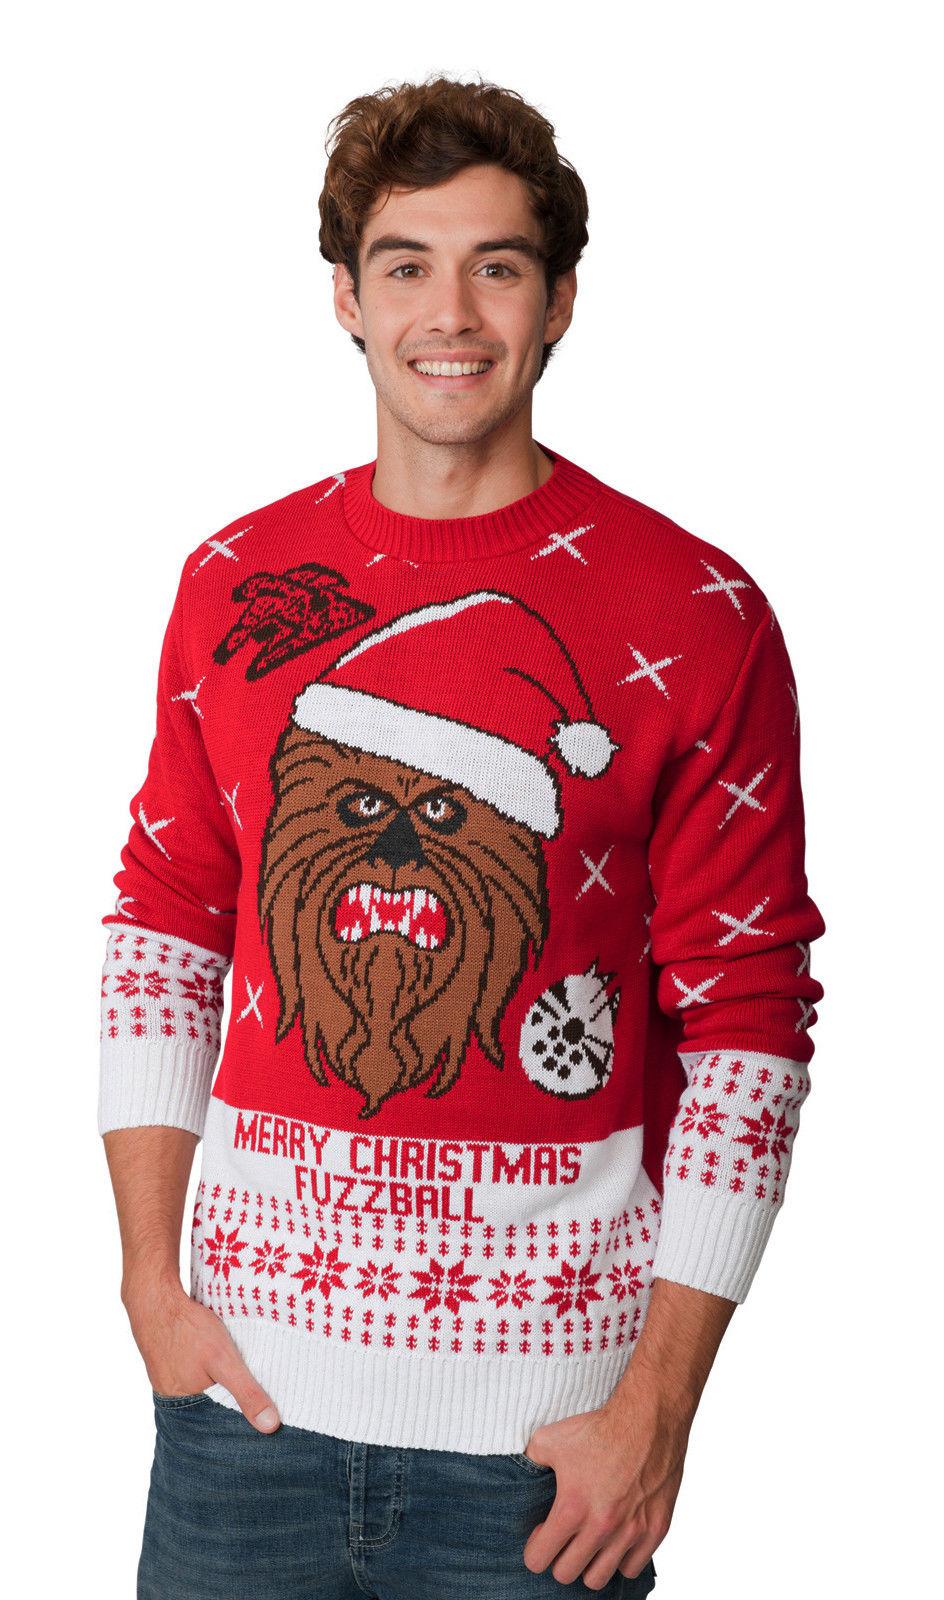 c8b6f21eb74 Chewbacca Star Wars vánoční svetr